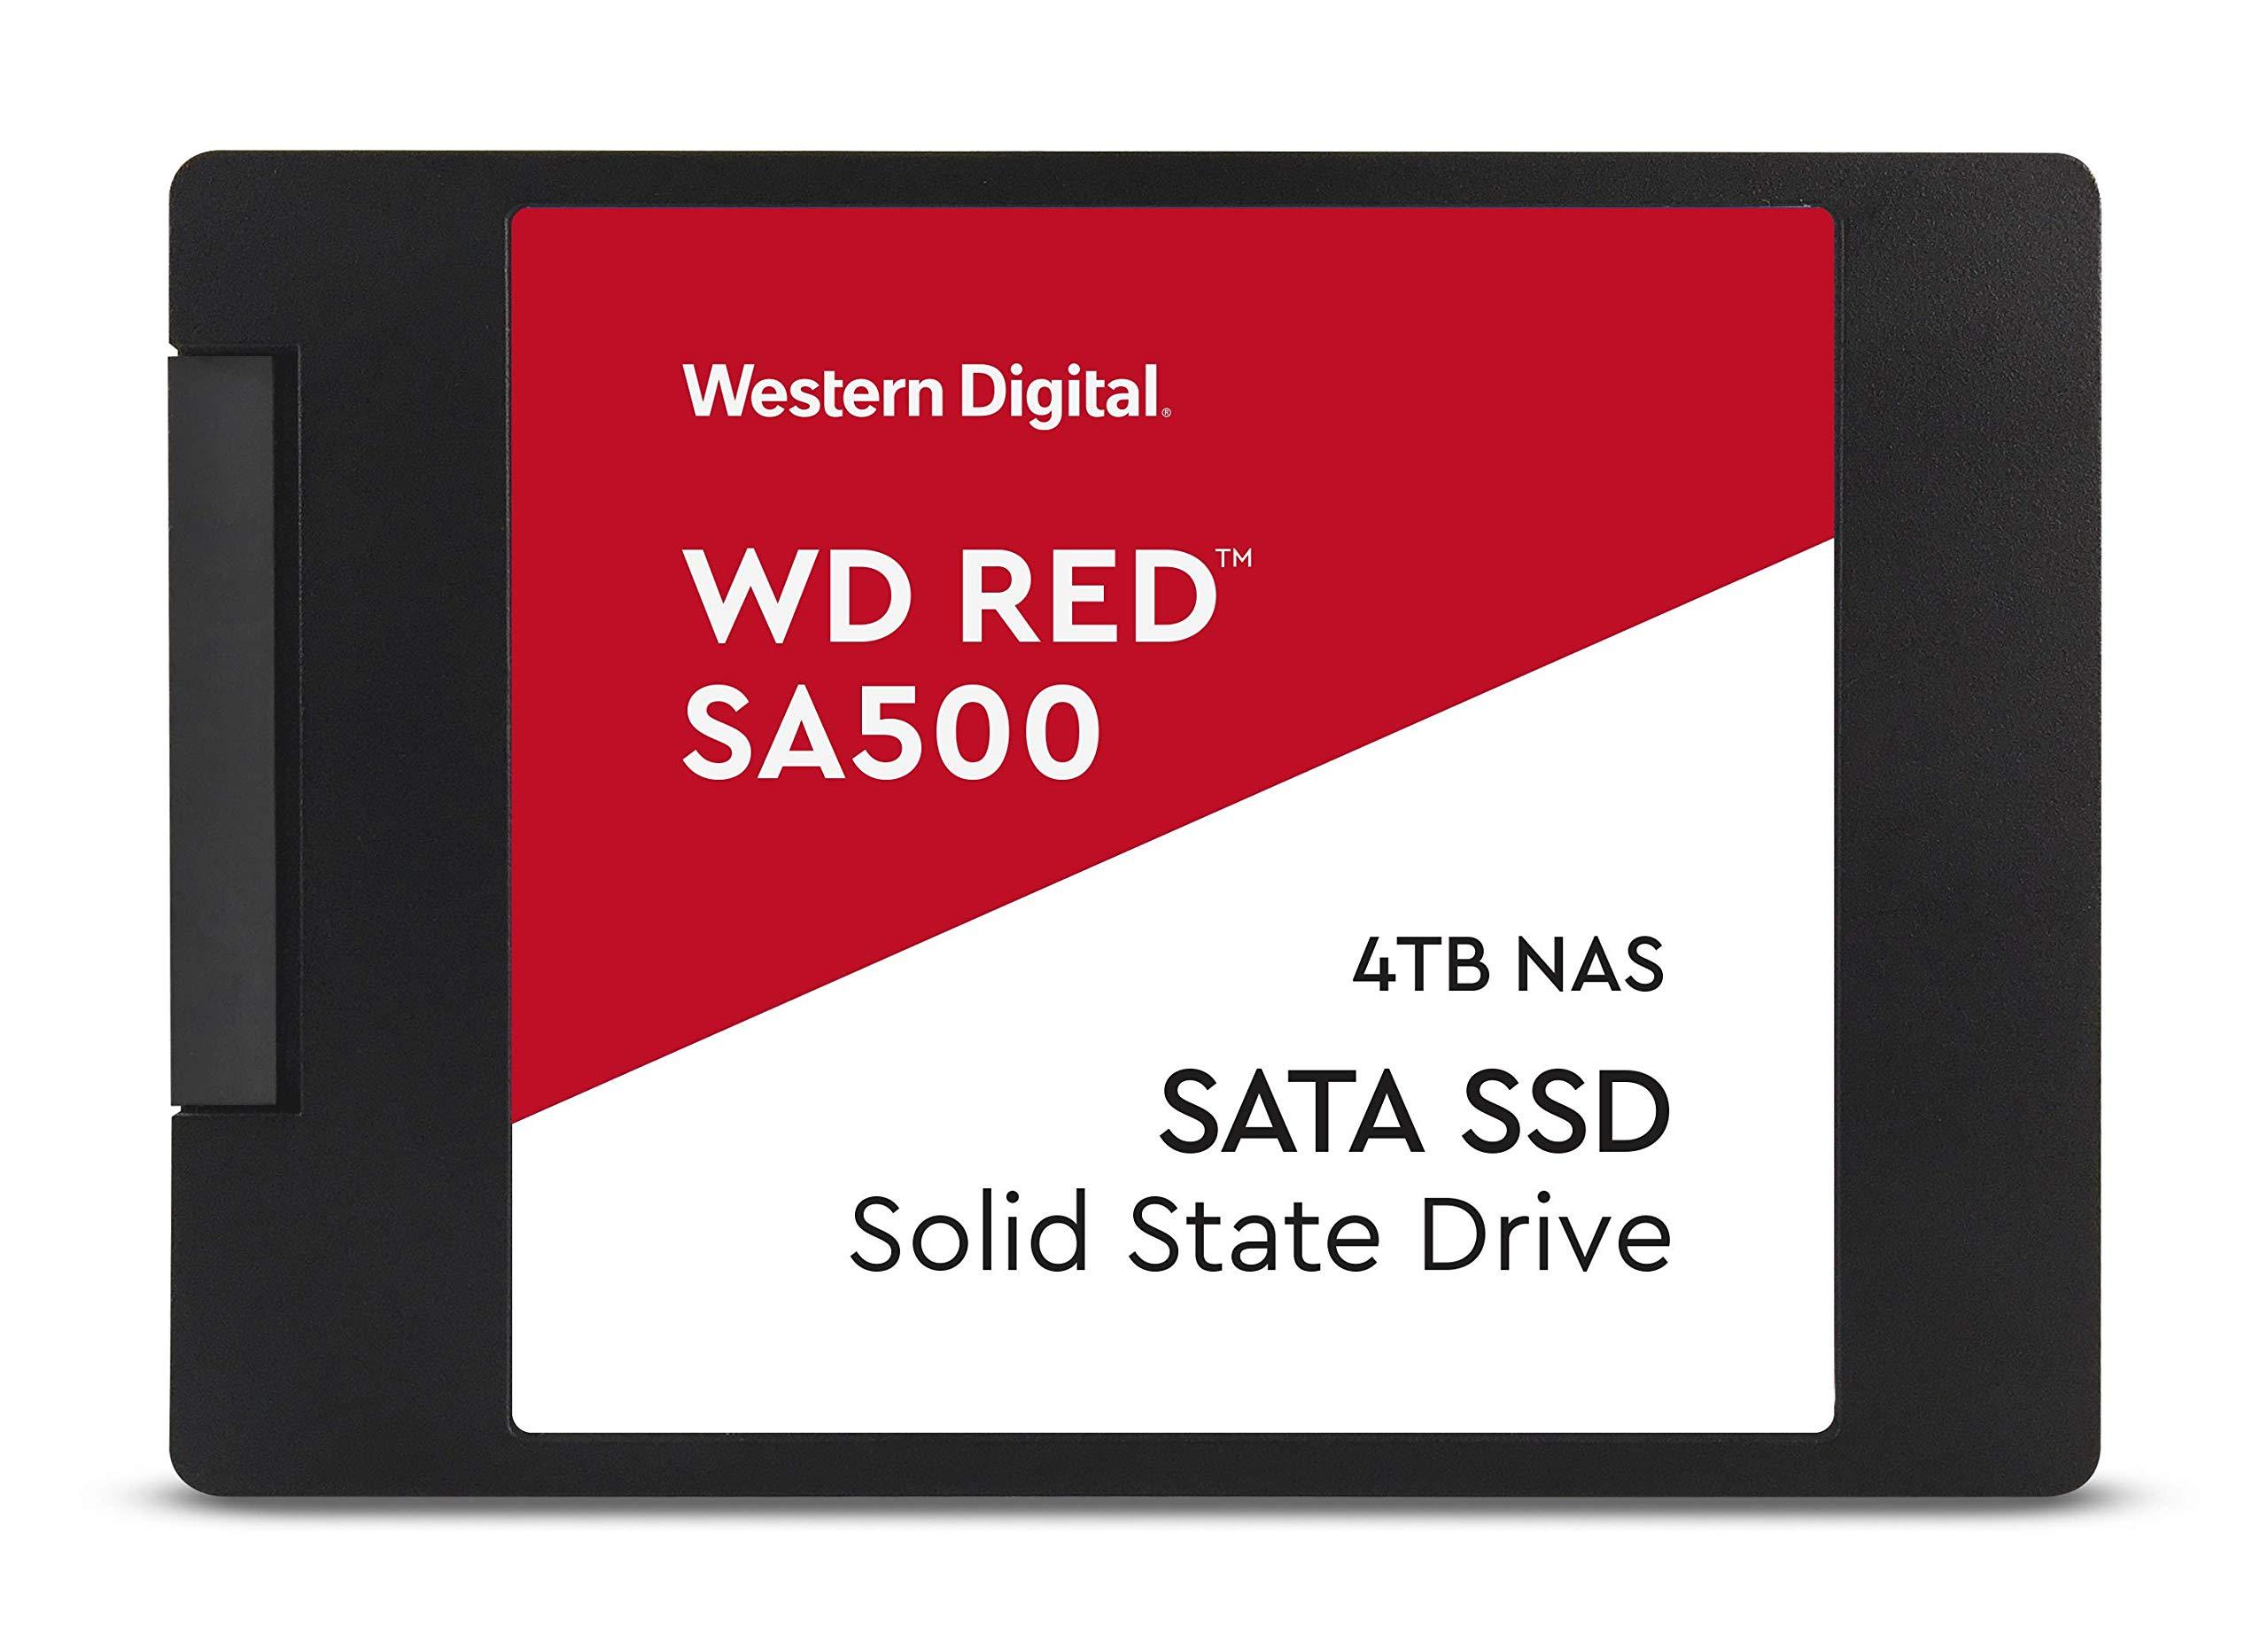 SSD 4TB SATA WD Red SA500 NAS 4TB 3D NAND 6 GB/S 2.5/7mm Up